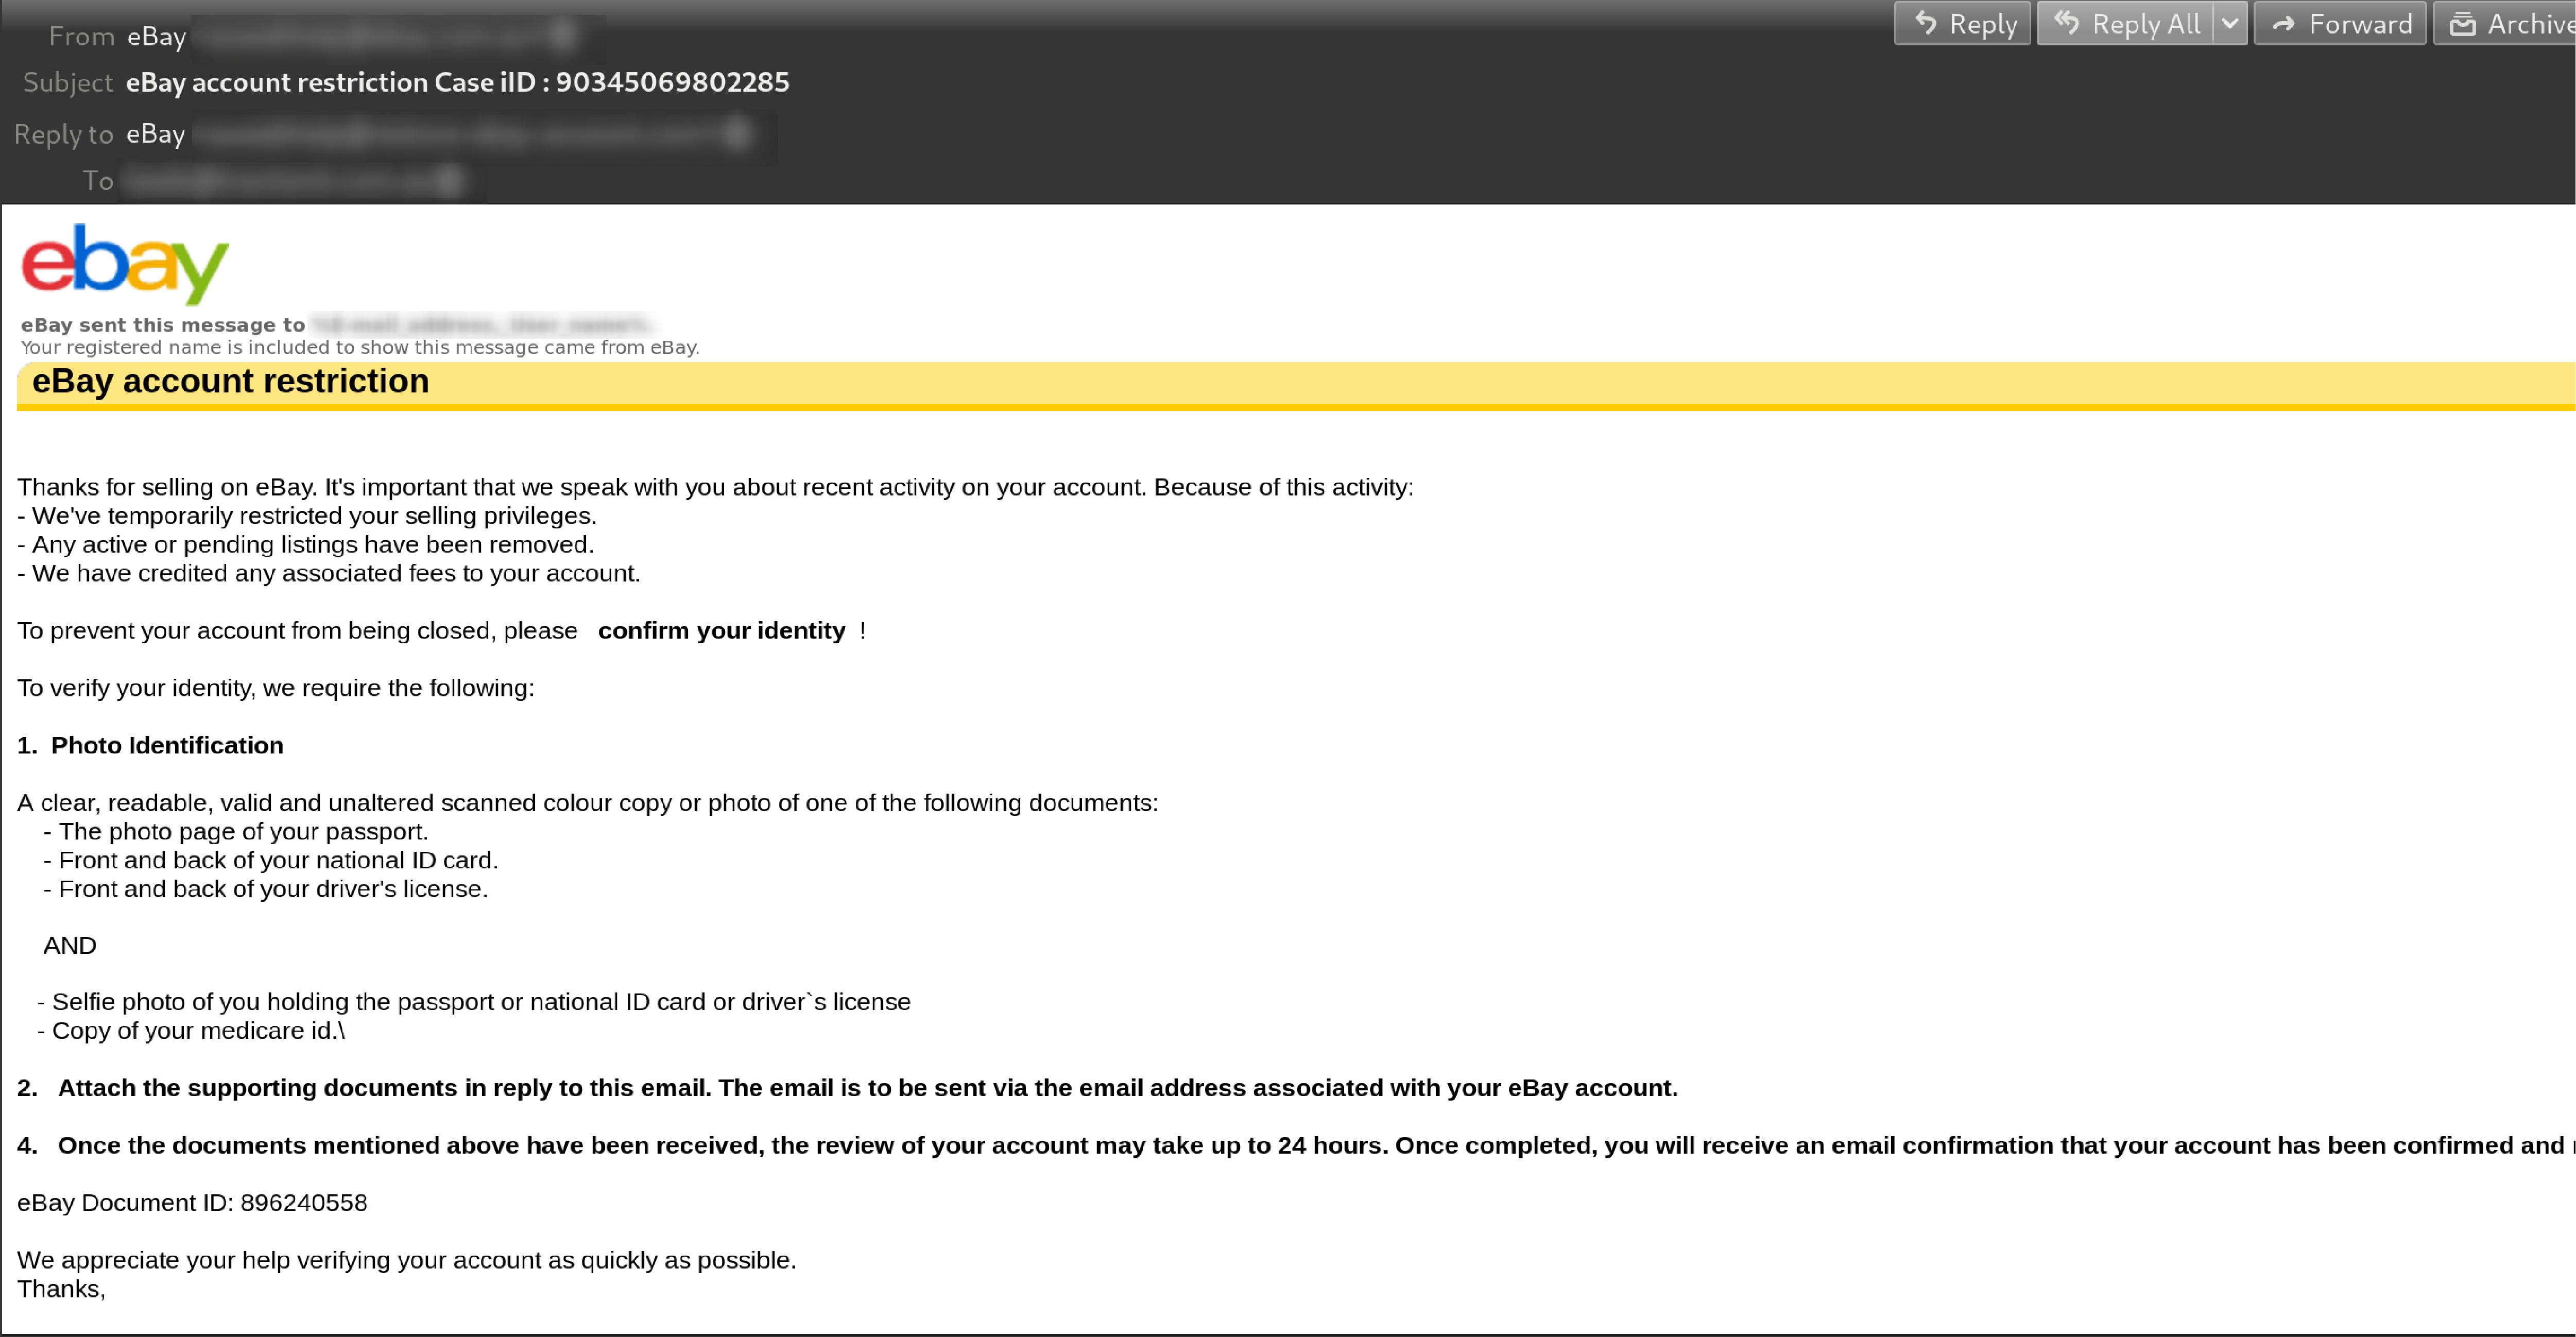 ebay phishing email social